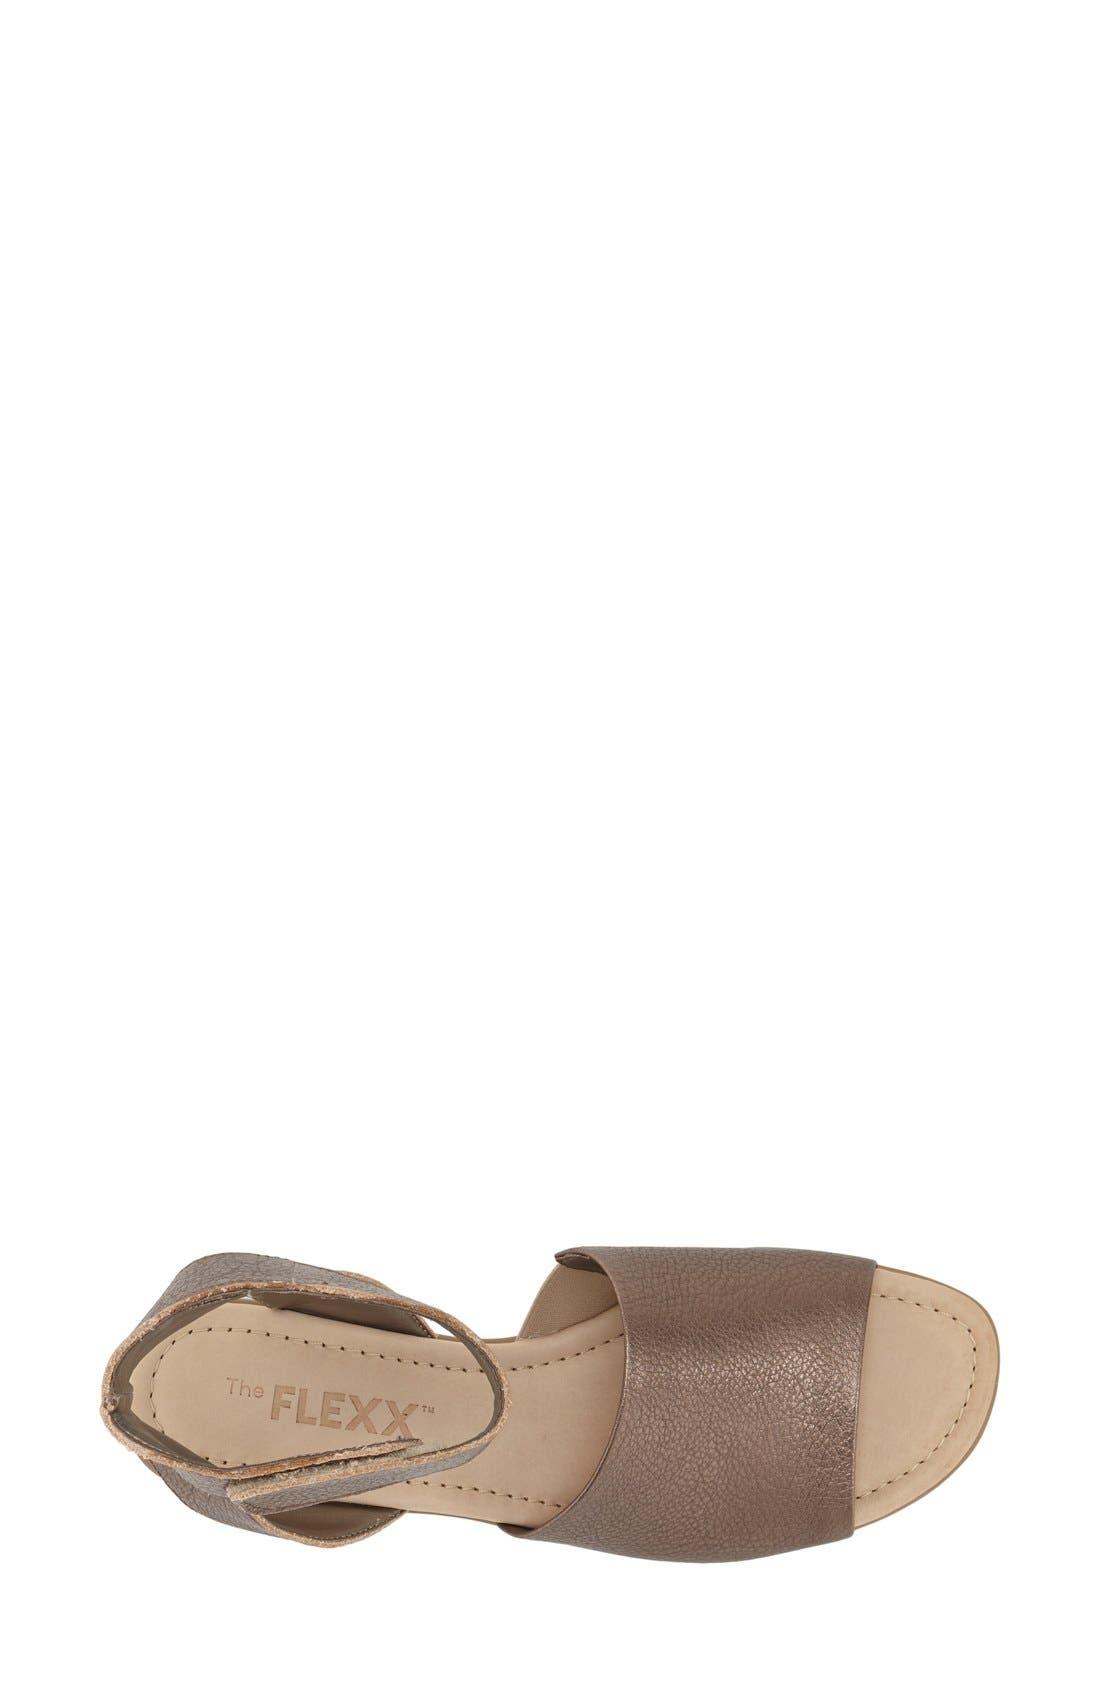 'Beglad' Leather Ankle Strap Sandal,                             Alternate thumbnail 40, color,